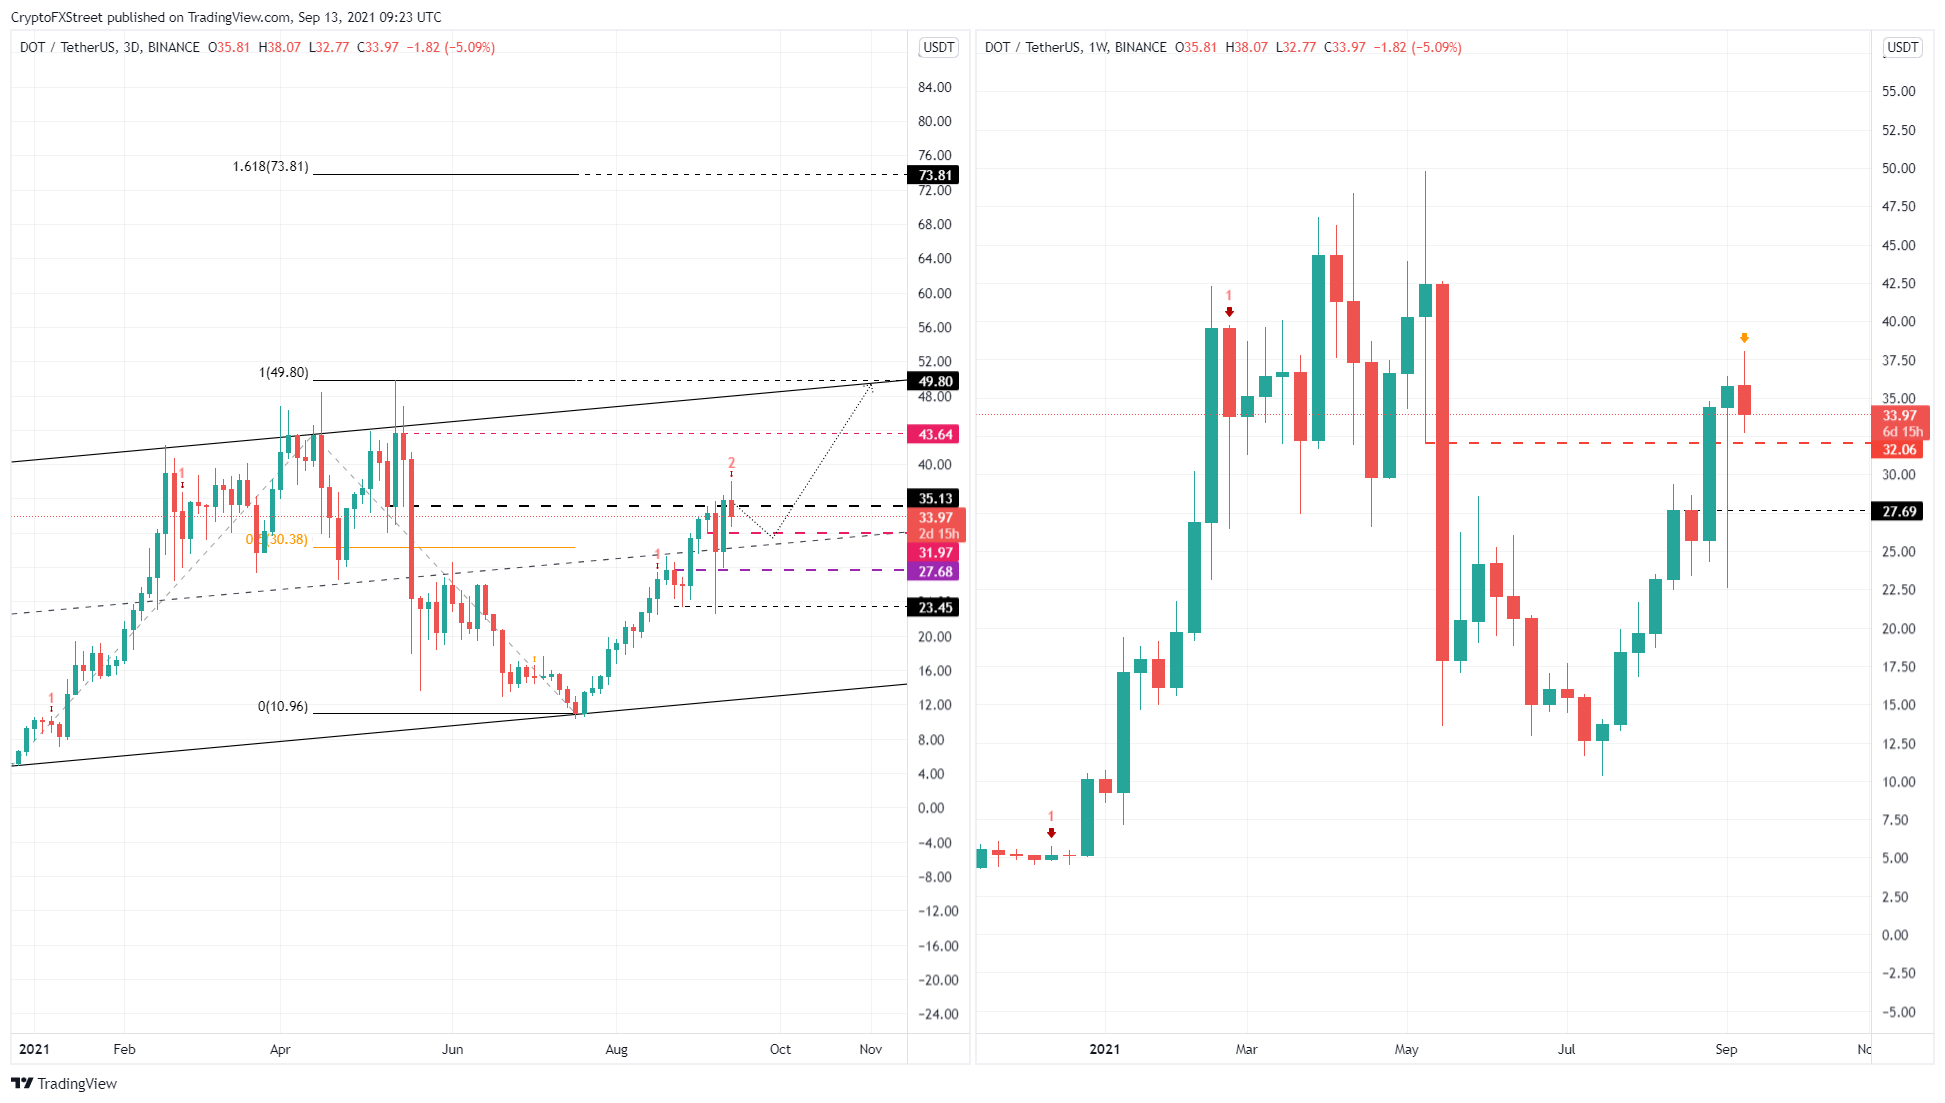 DOT/USDT 3-day, 1-week chart